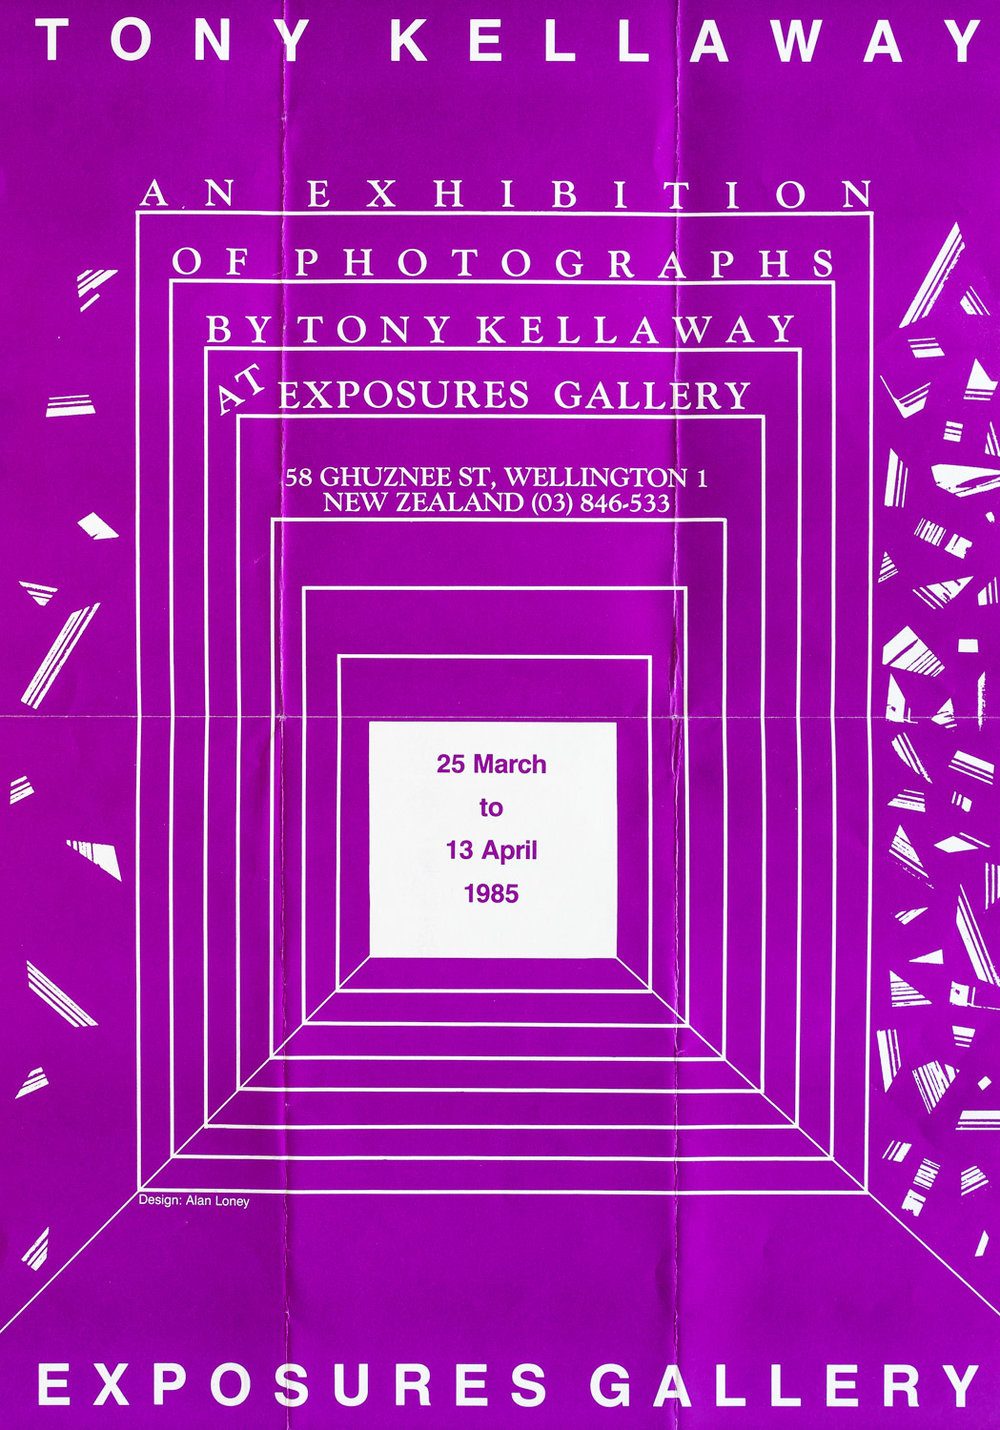 Tony Kellaway25 March – 13 April, 1985. Design: Alan Loney